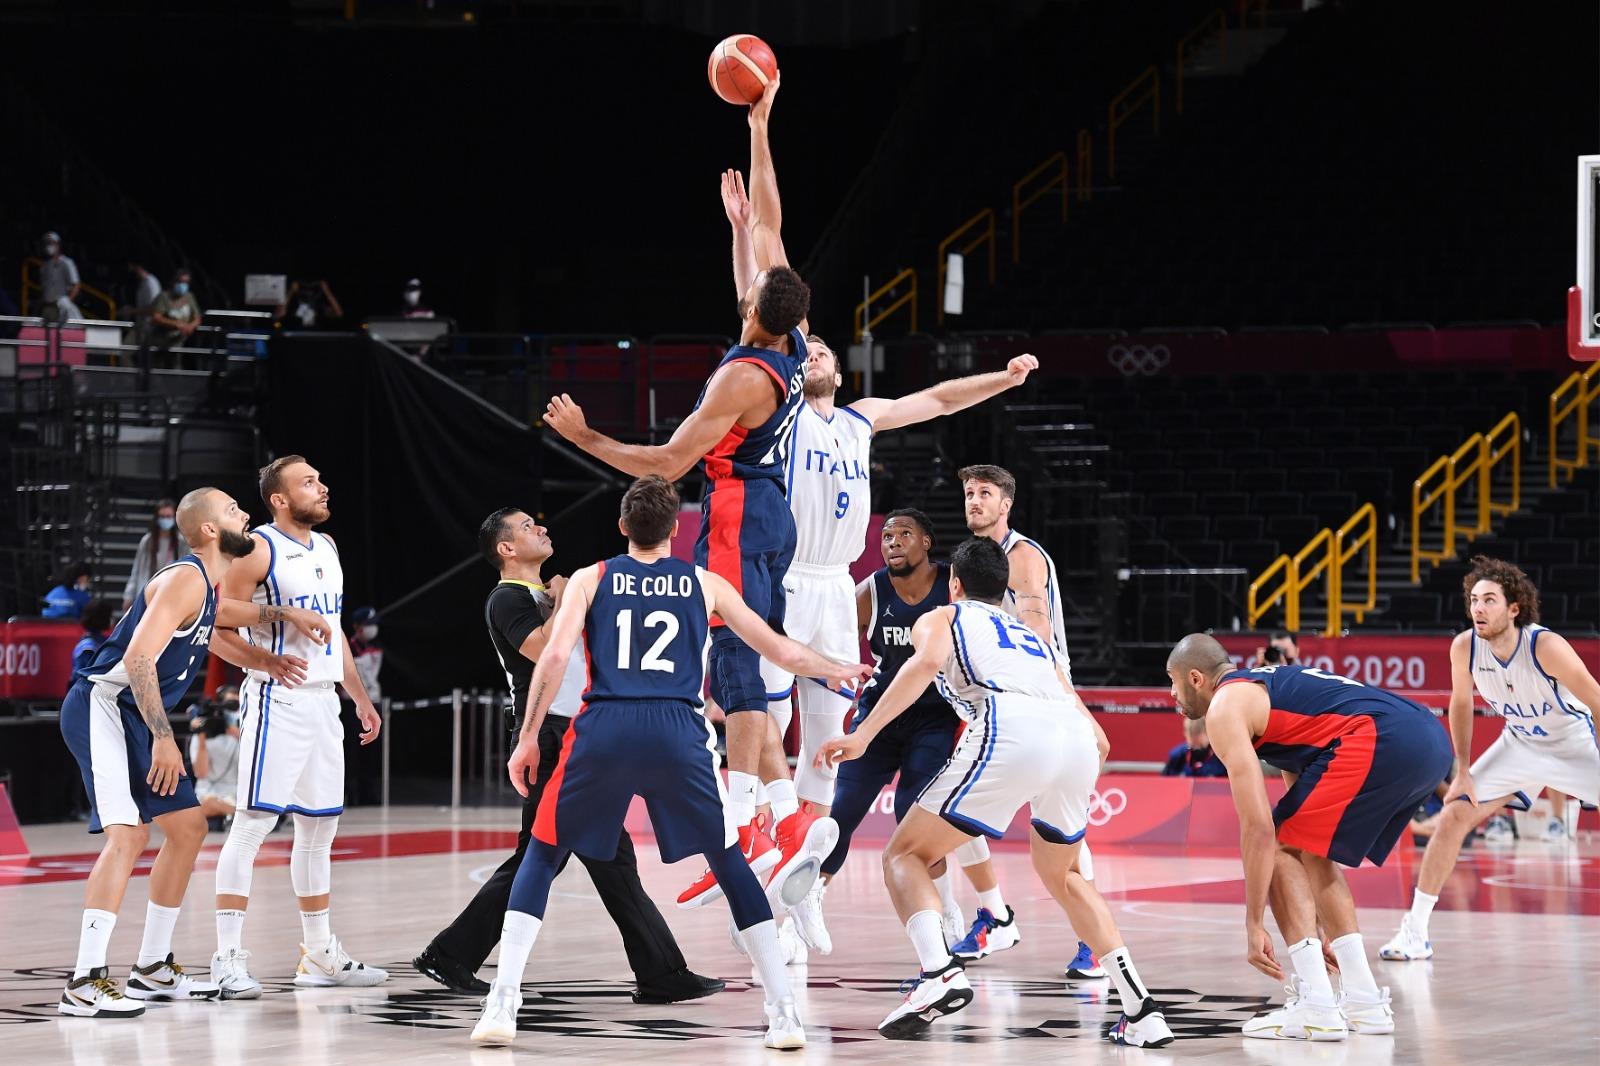 Basket, Italia eliminata ai quarti dalla Francia